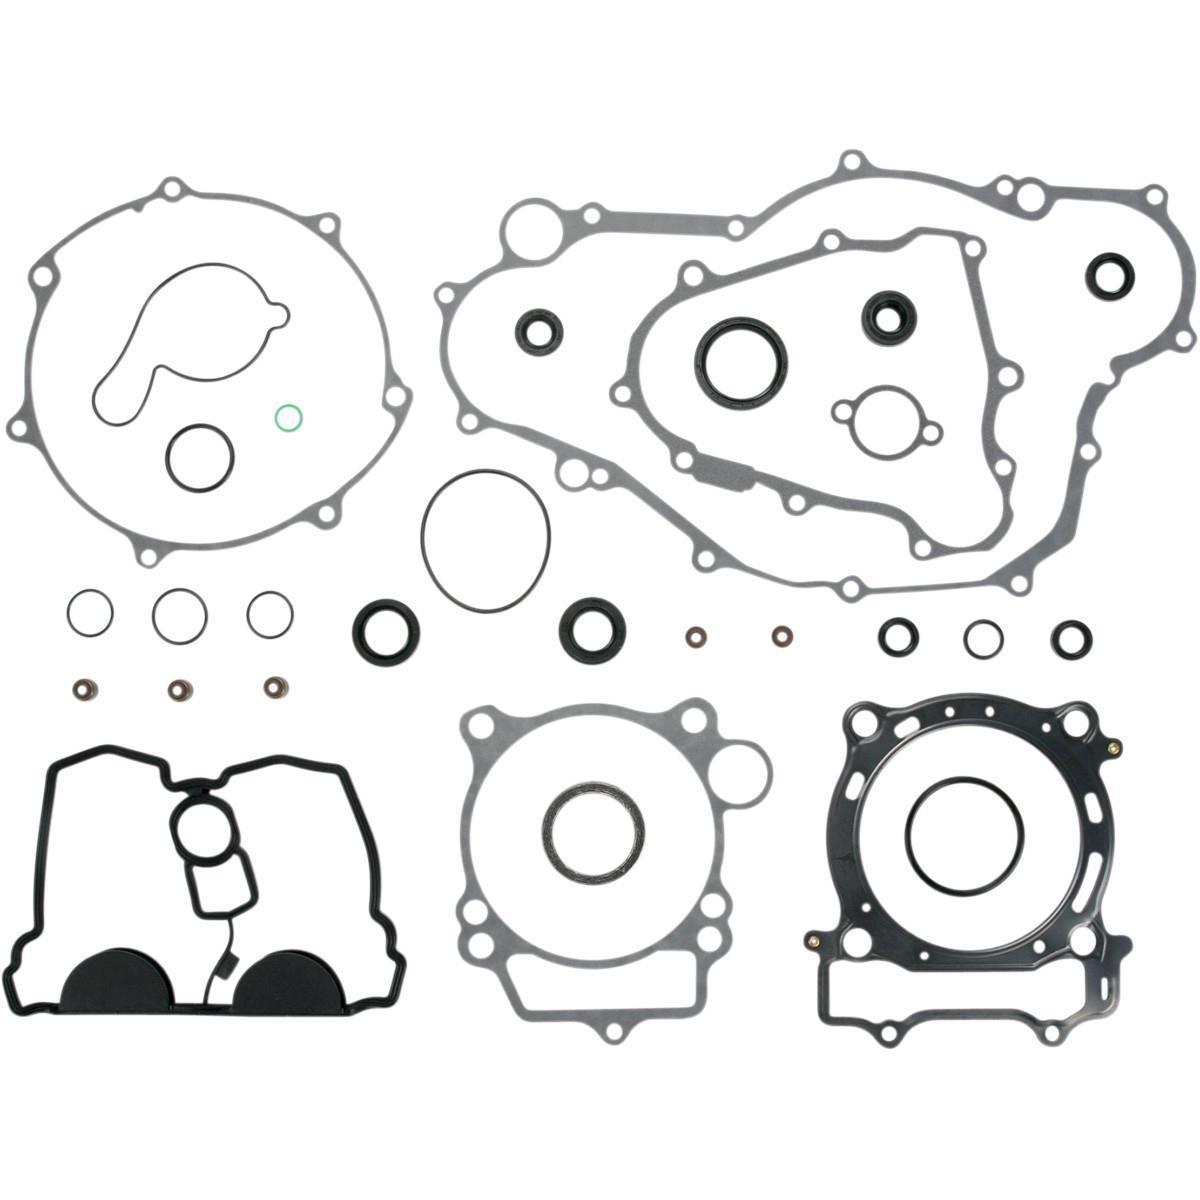 03 06 Yamaha Wr450f Moose Racing Gasket Kit Set W Oil